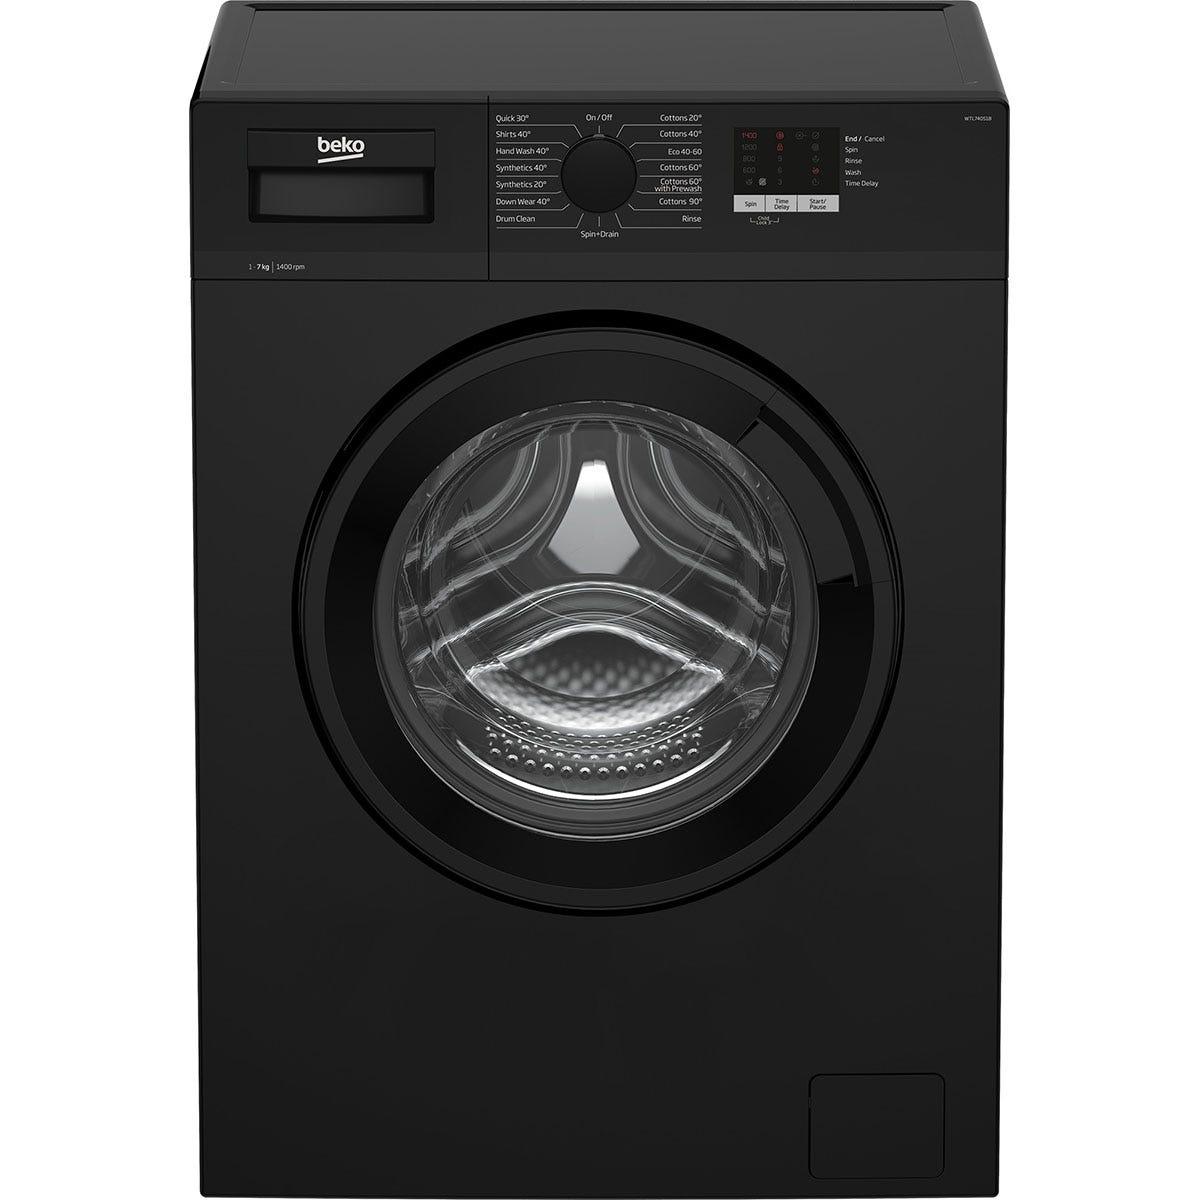 Beko WTL74051B 7kg Washing Machine - Black